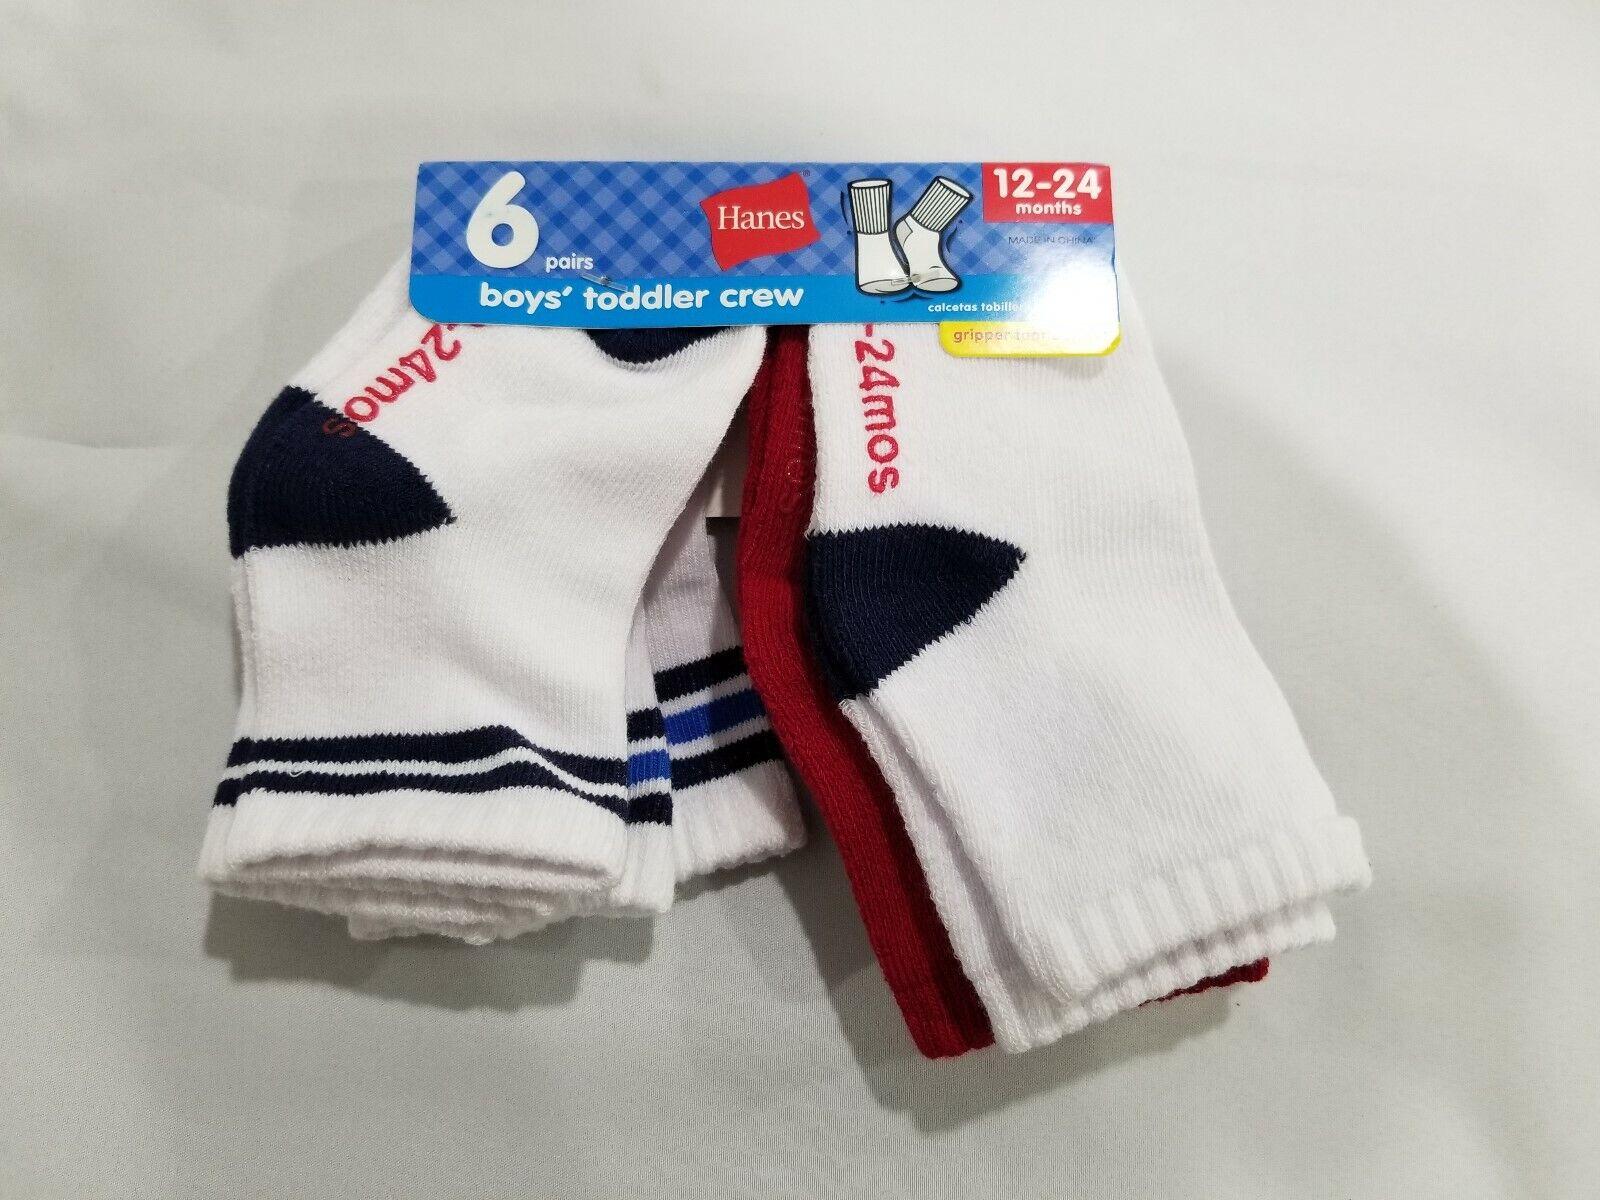 Hanes Boys' Toddler Size 12-24 Months Crew Socks- 6 pack